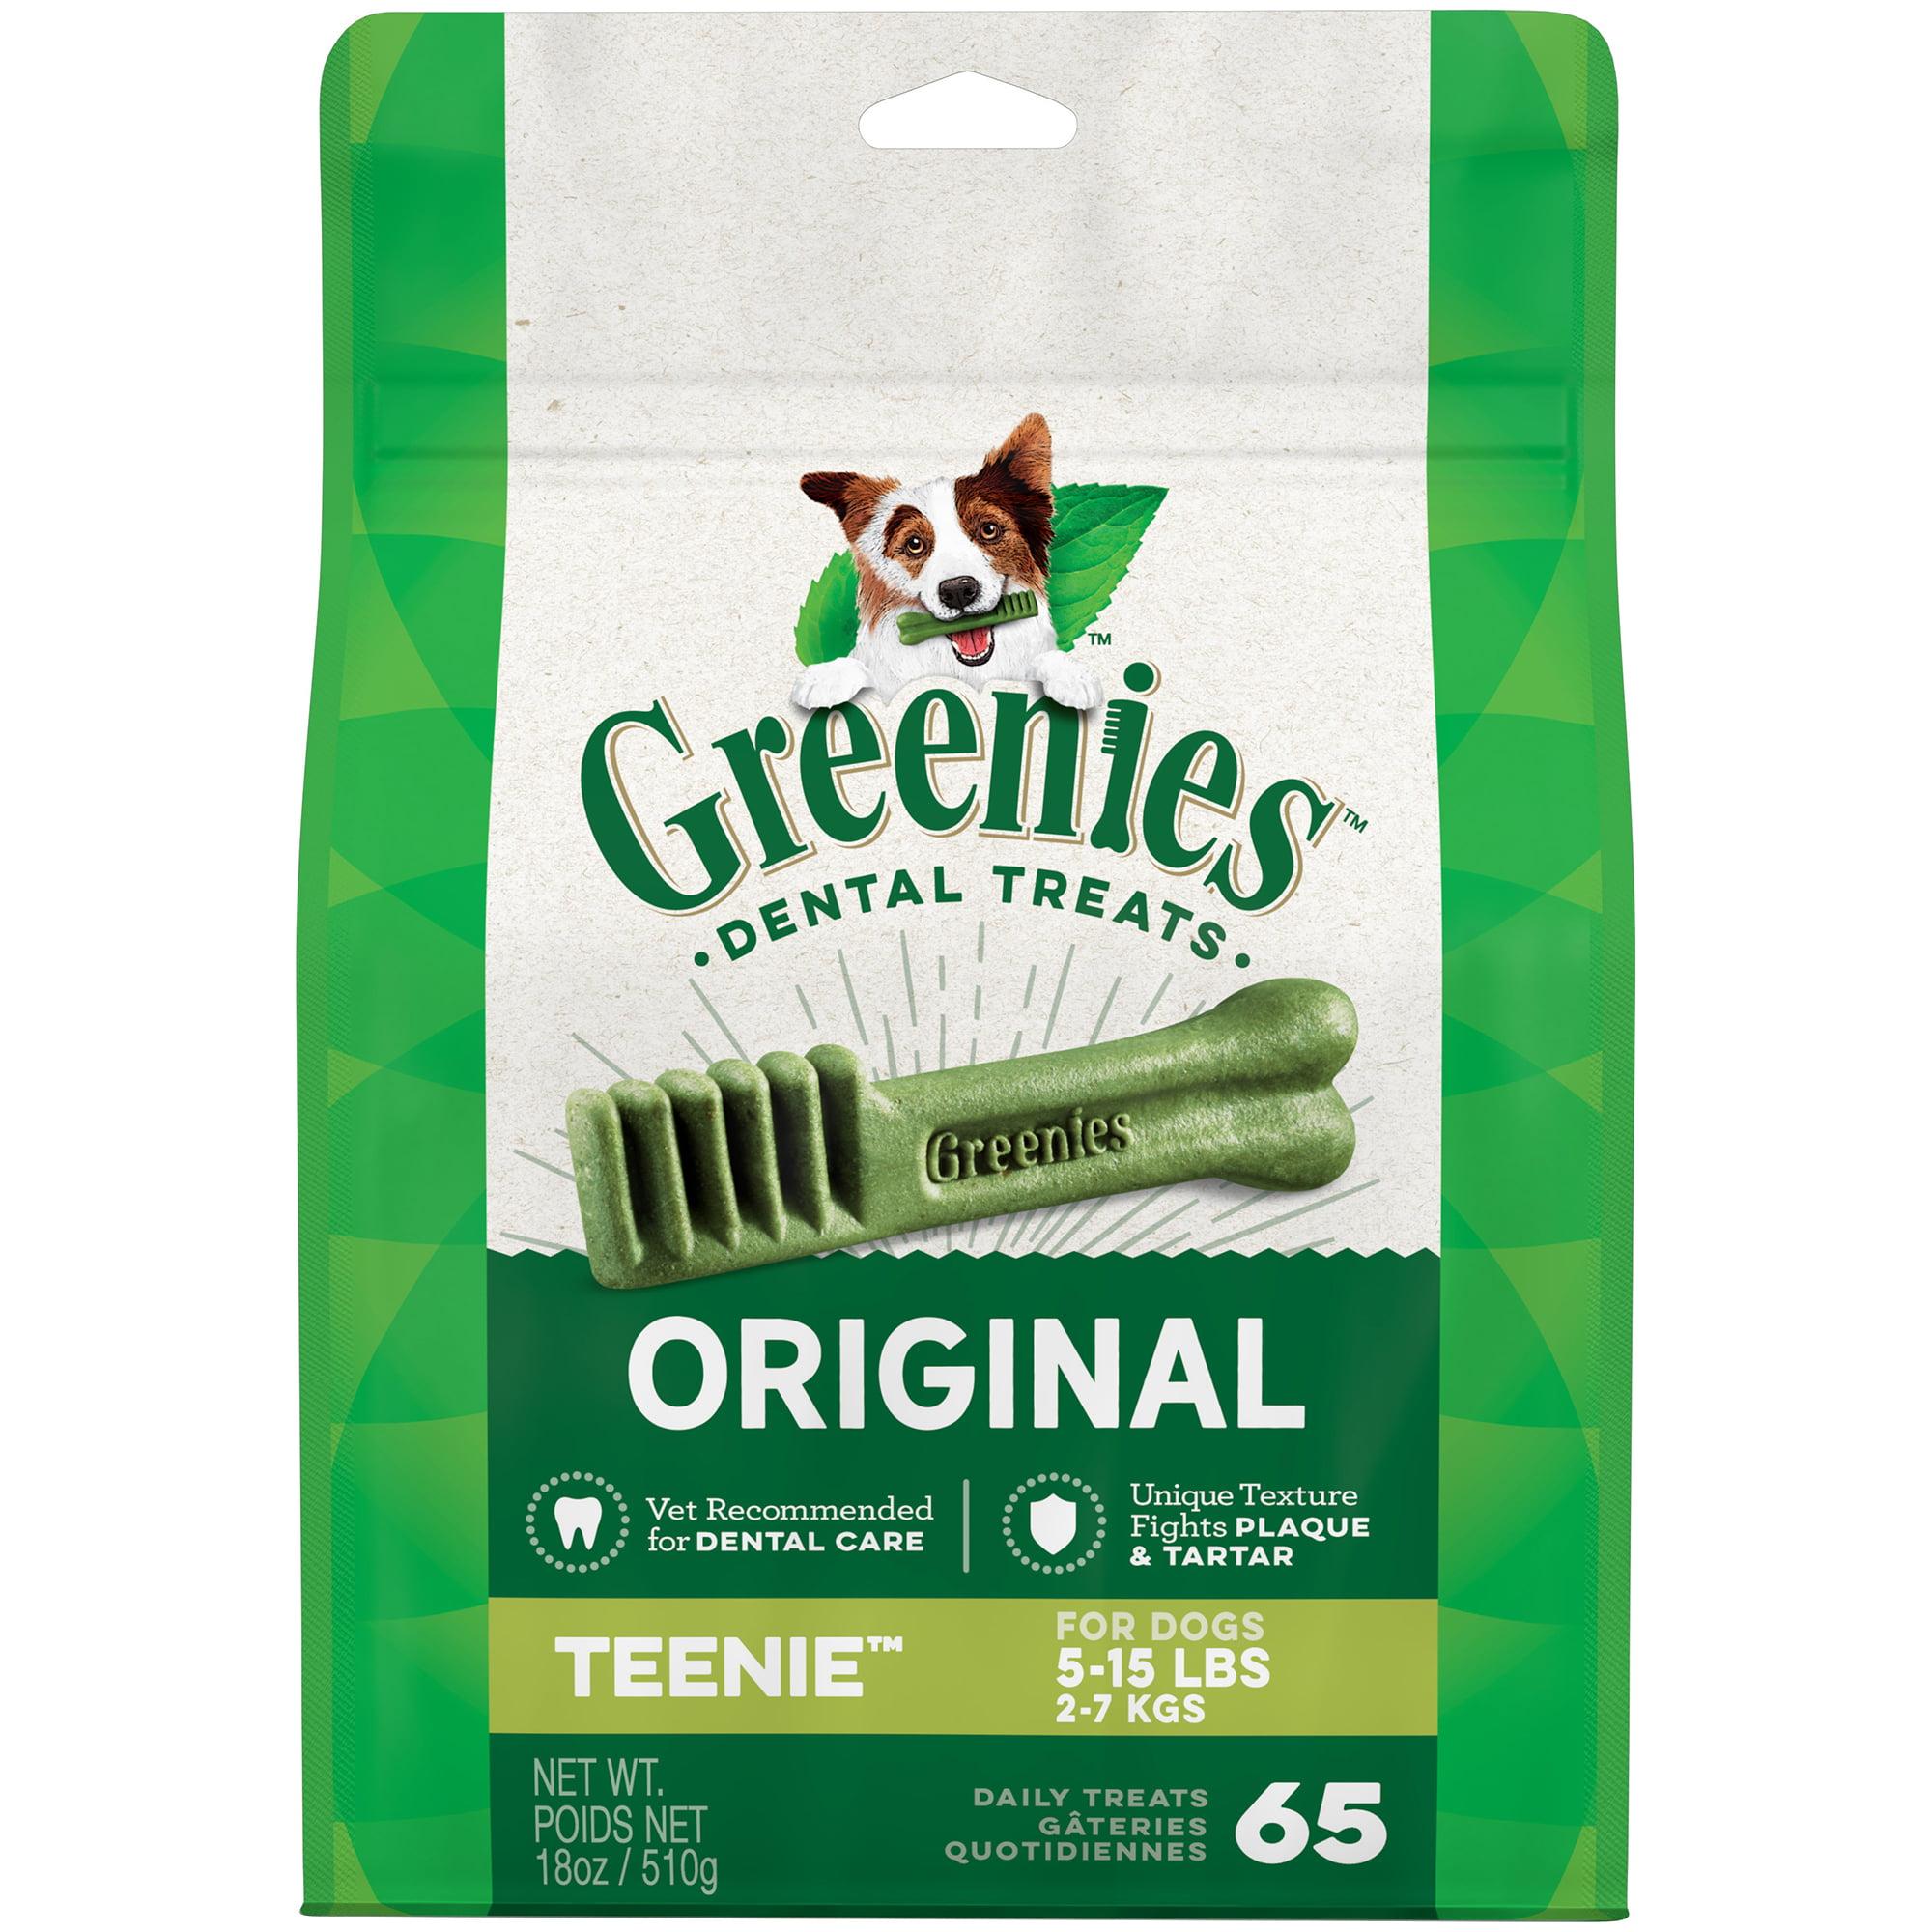 GREENIES Original TEENIE Dental Dog Treats, 18 oz. Pack (65 Treats) by Mars Petcare